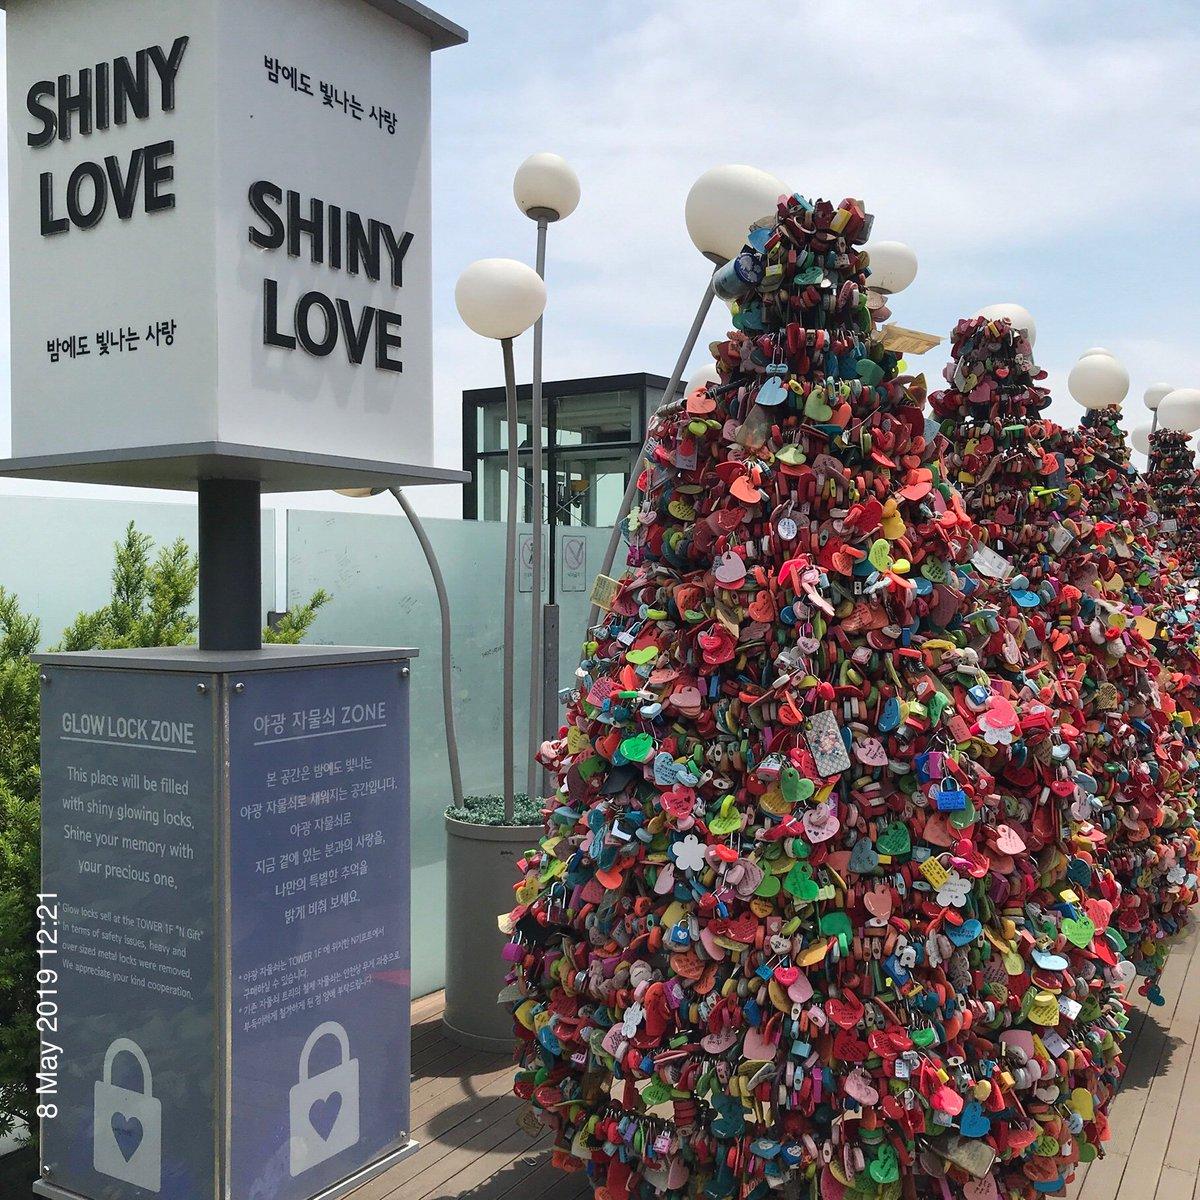 Plenty of Shiny Love locks by N Seoul Tower